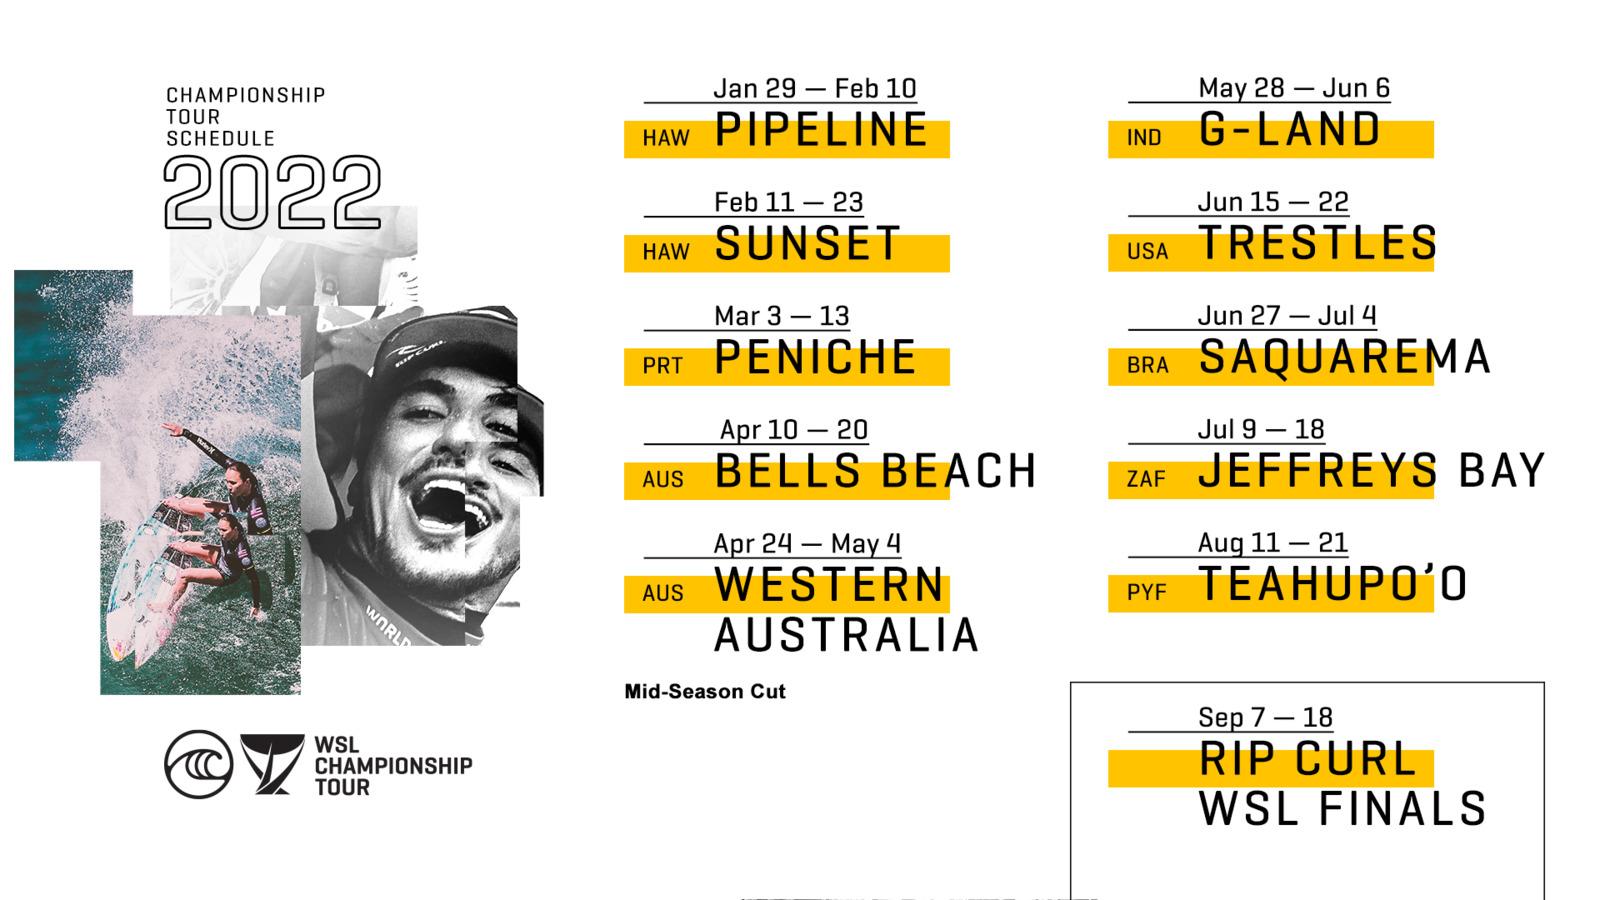 2022 Championship Tour calendar_max